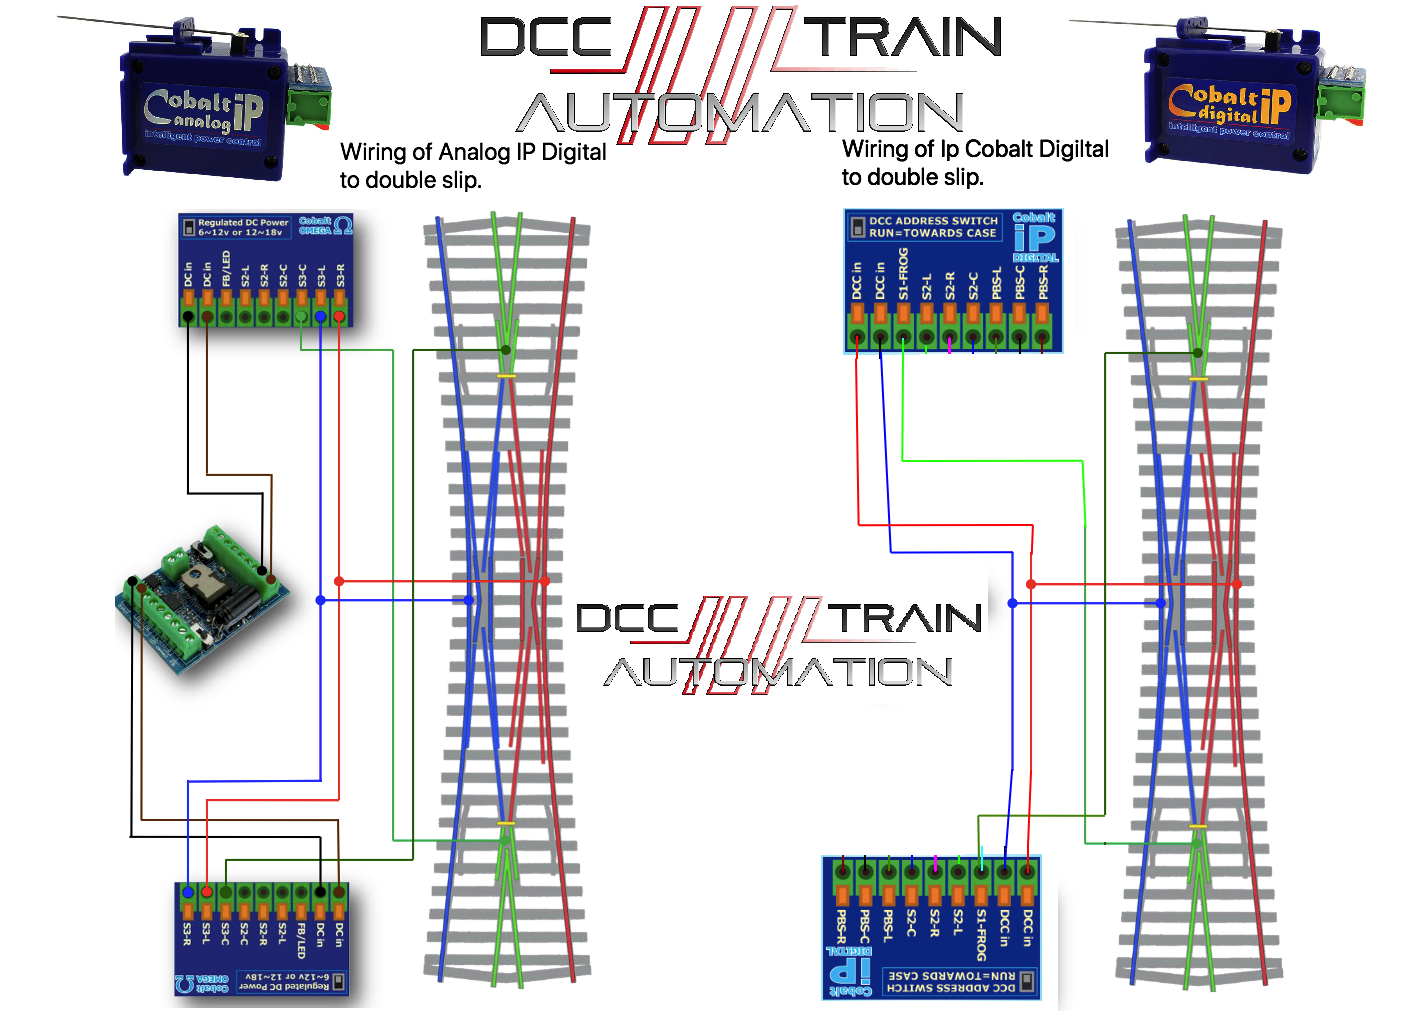 Model Railway & Digital Control Specialists ... on